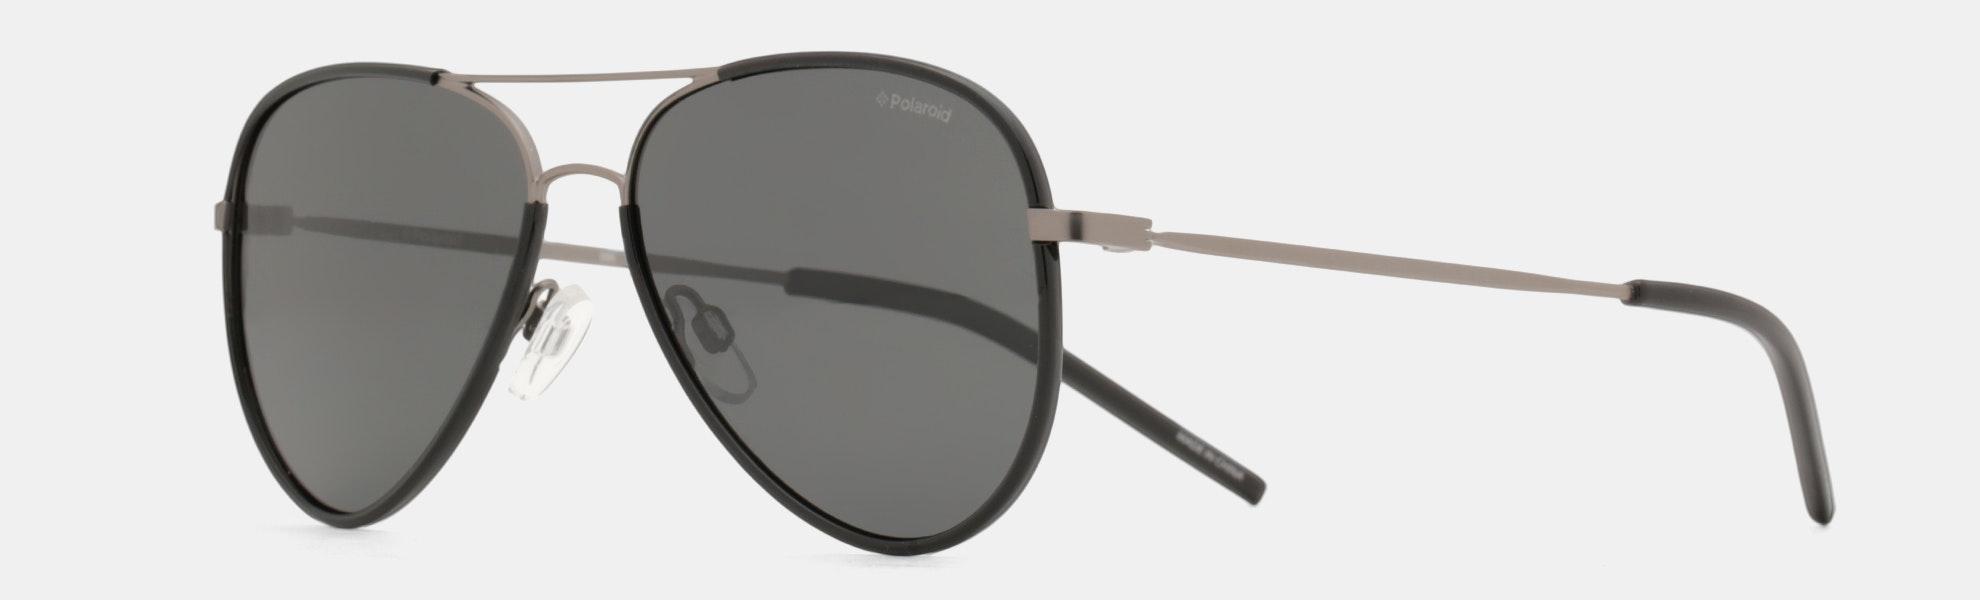 Polaroid Lightweight Polarized Aviator Sunglasses